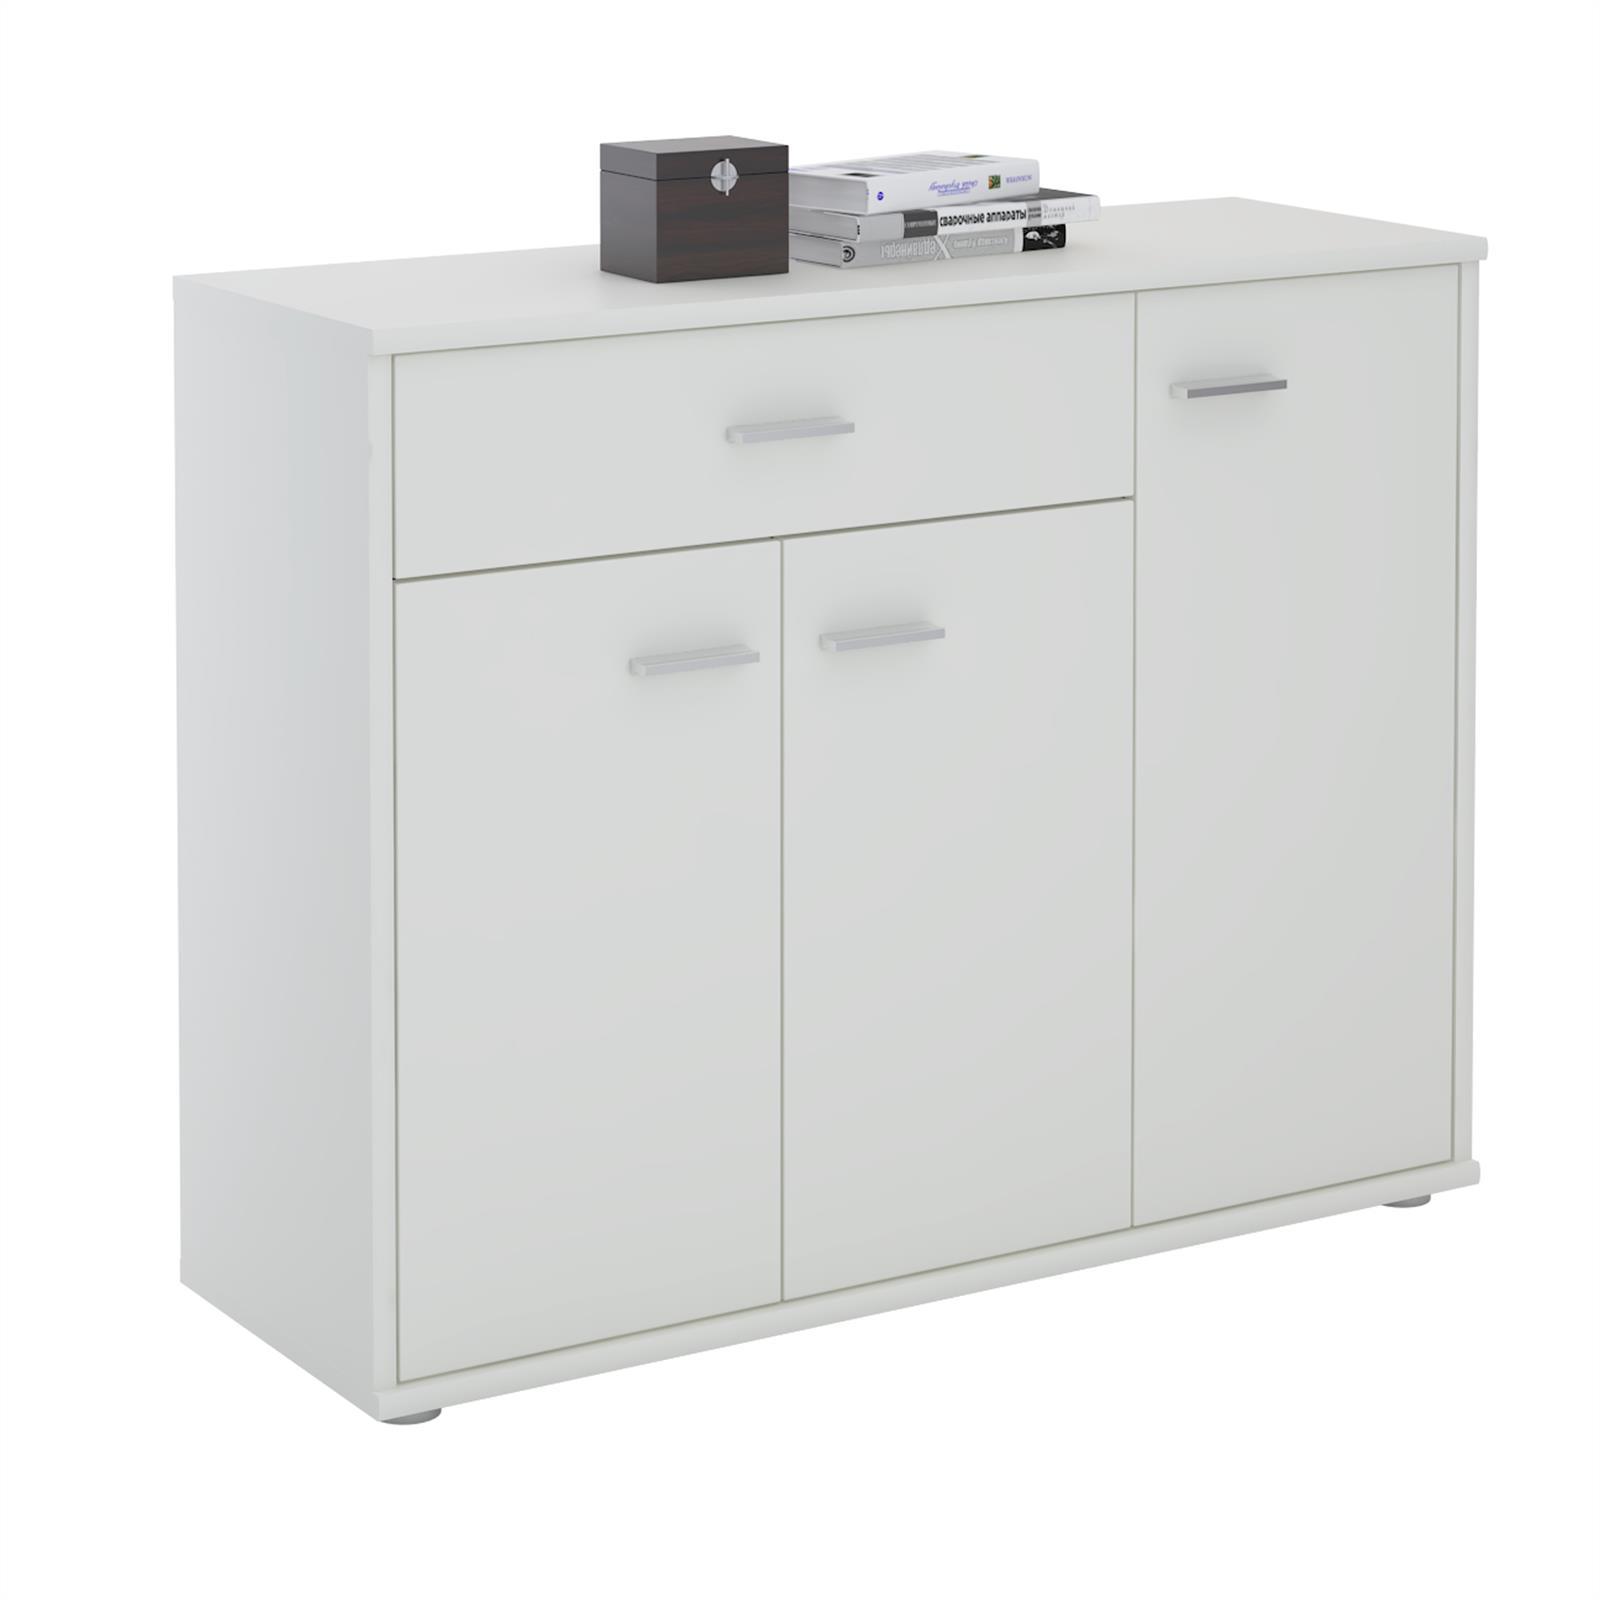 buffet coraline en m lamin blanc mat mobil meubles. Black Bedroom Furniture Sets. Home Design Ideas